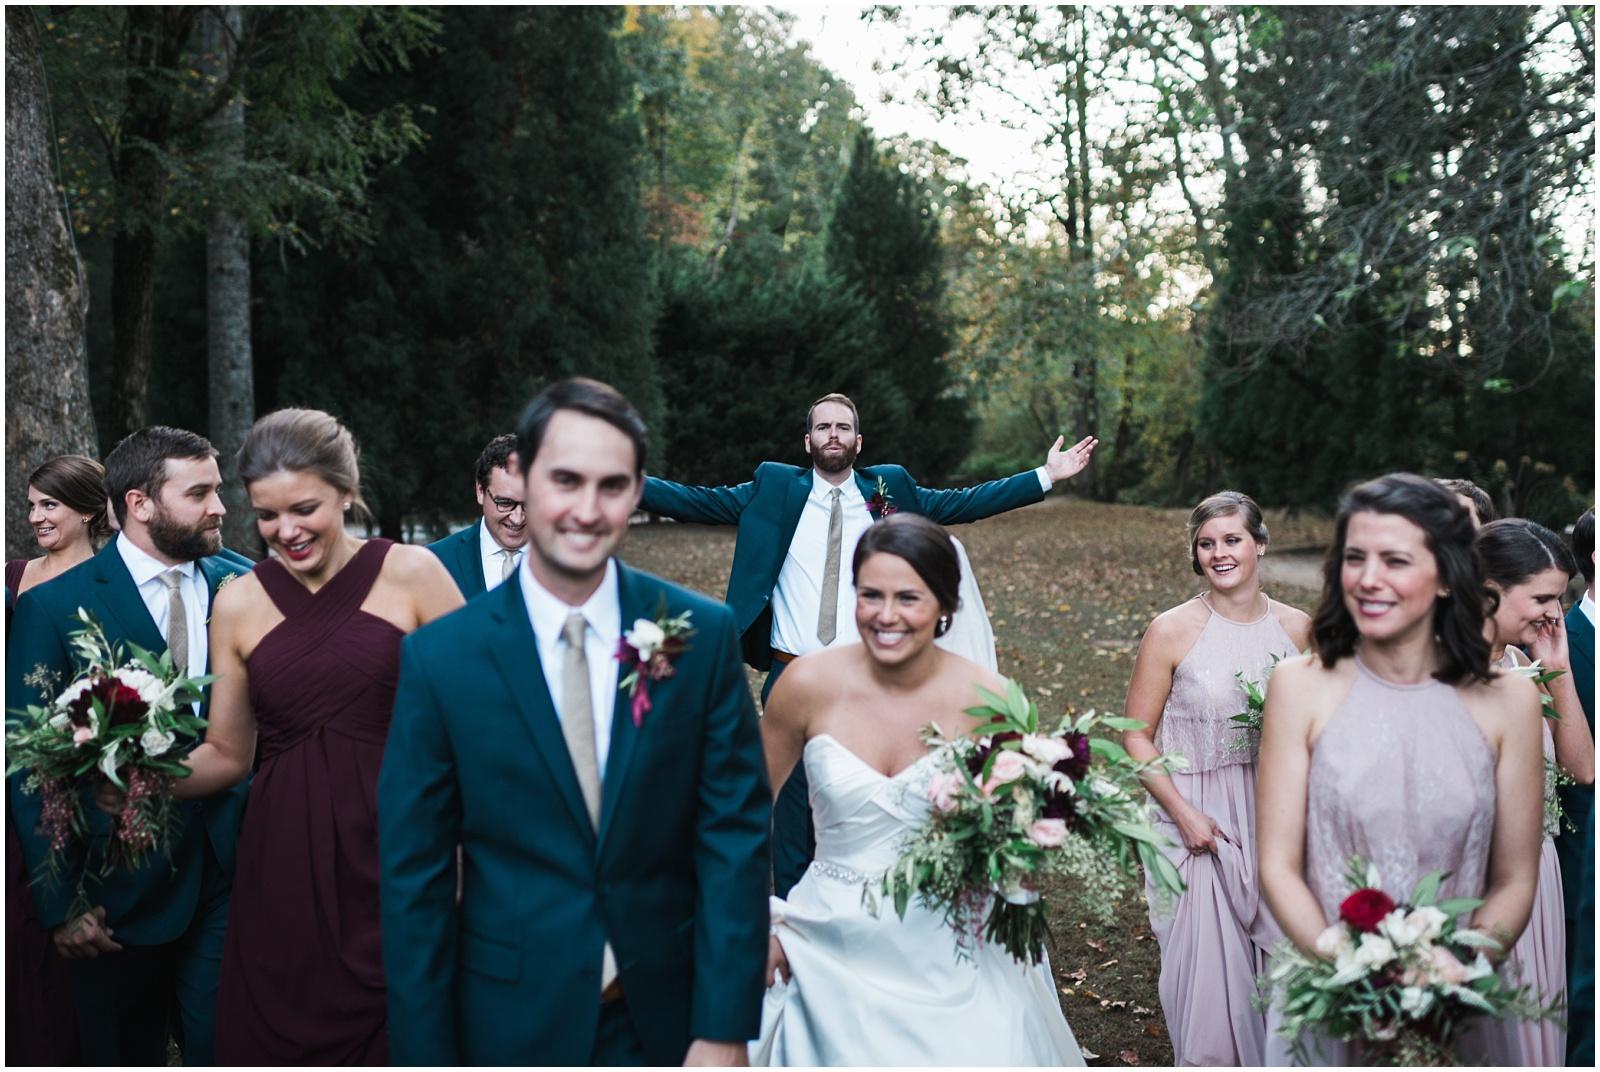 Wedding party walking candid